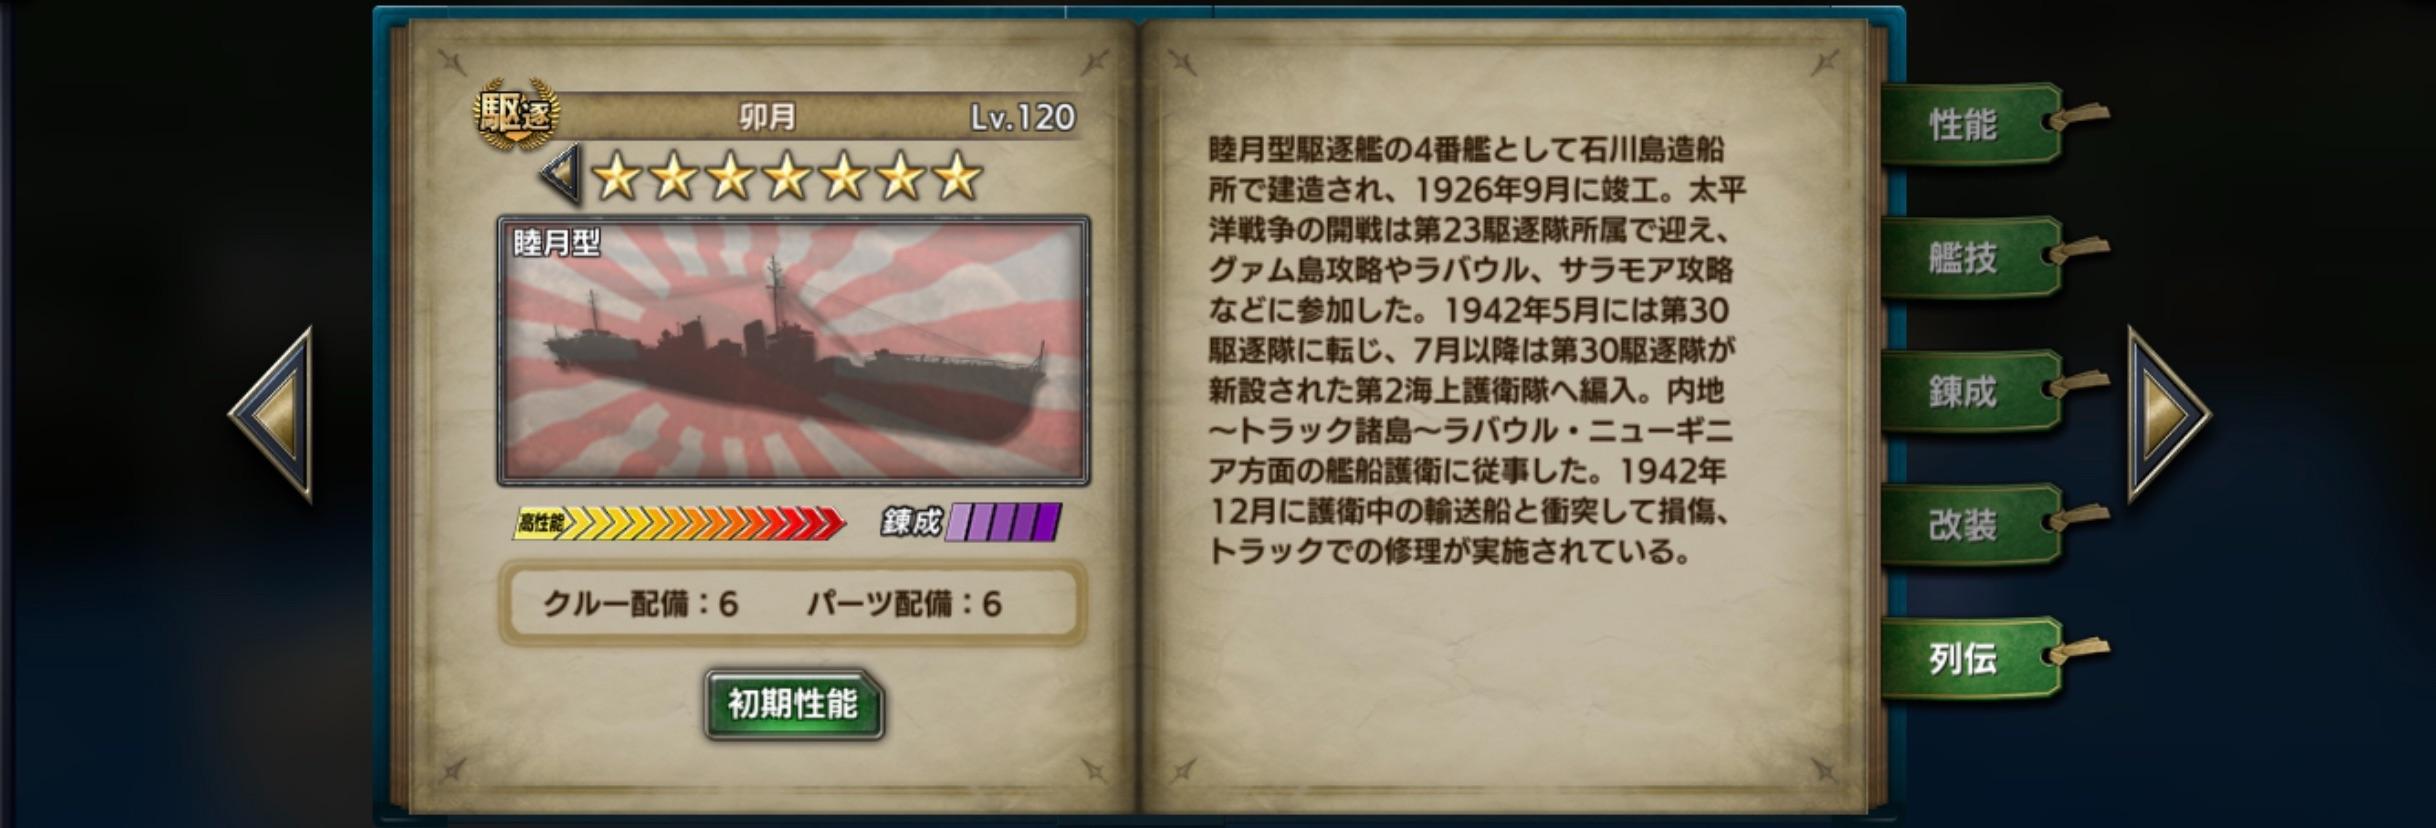 Uzuki-history